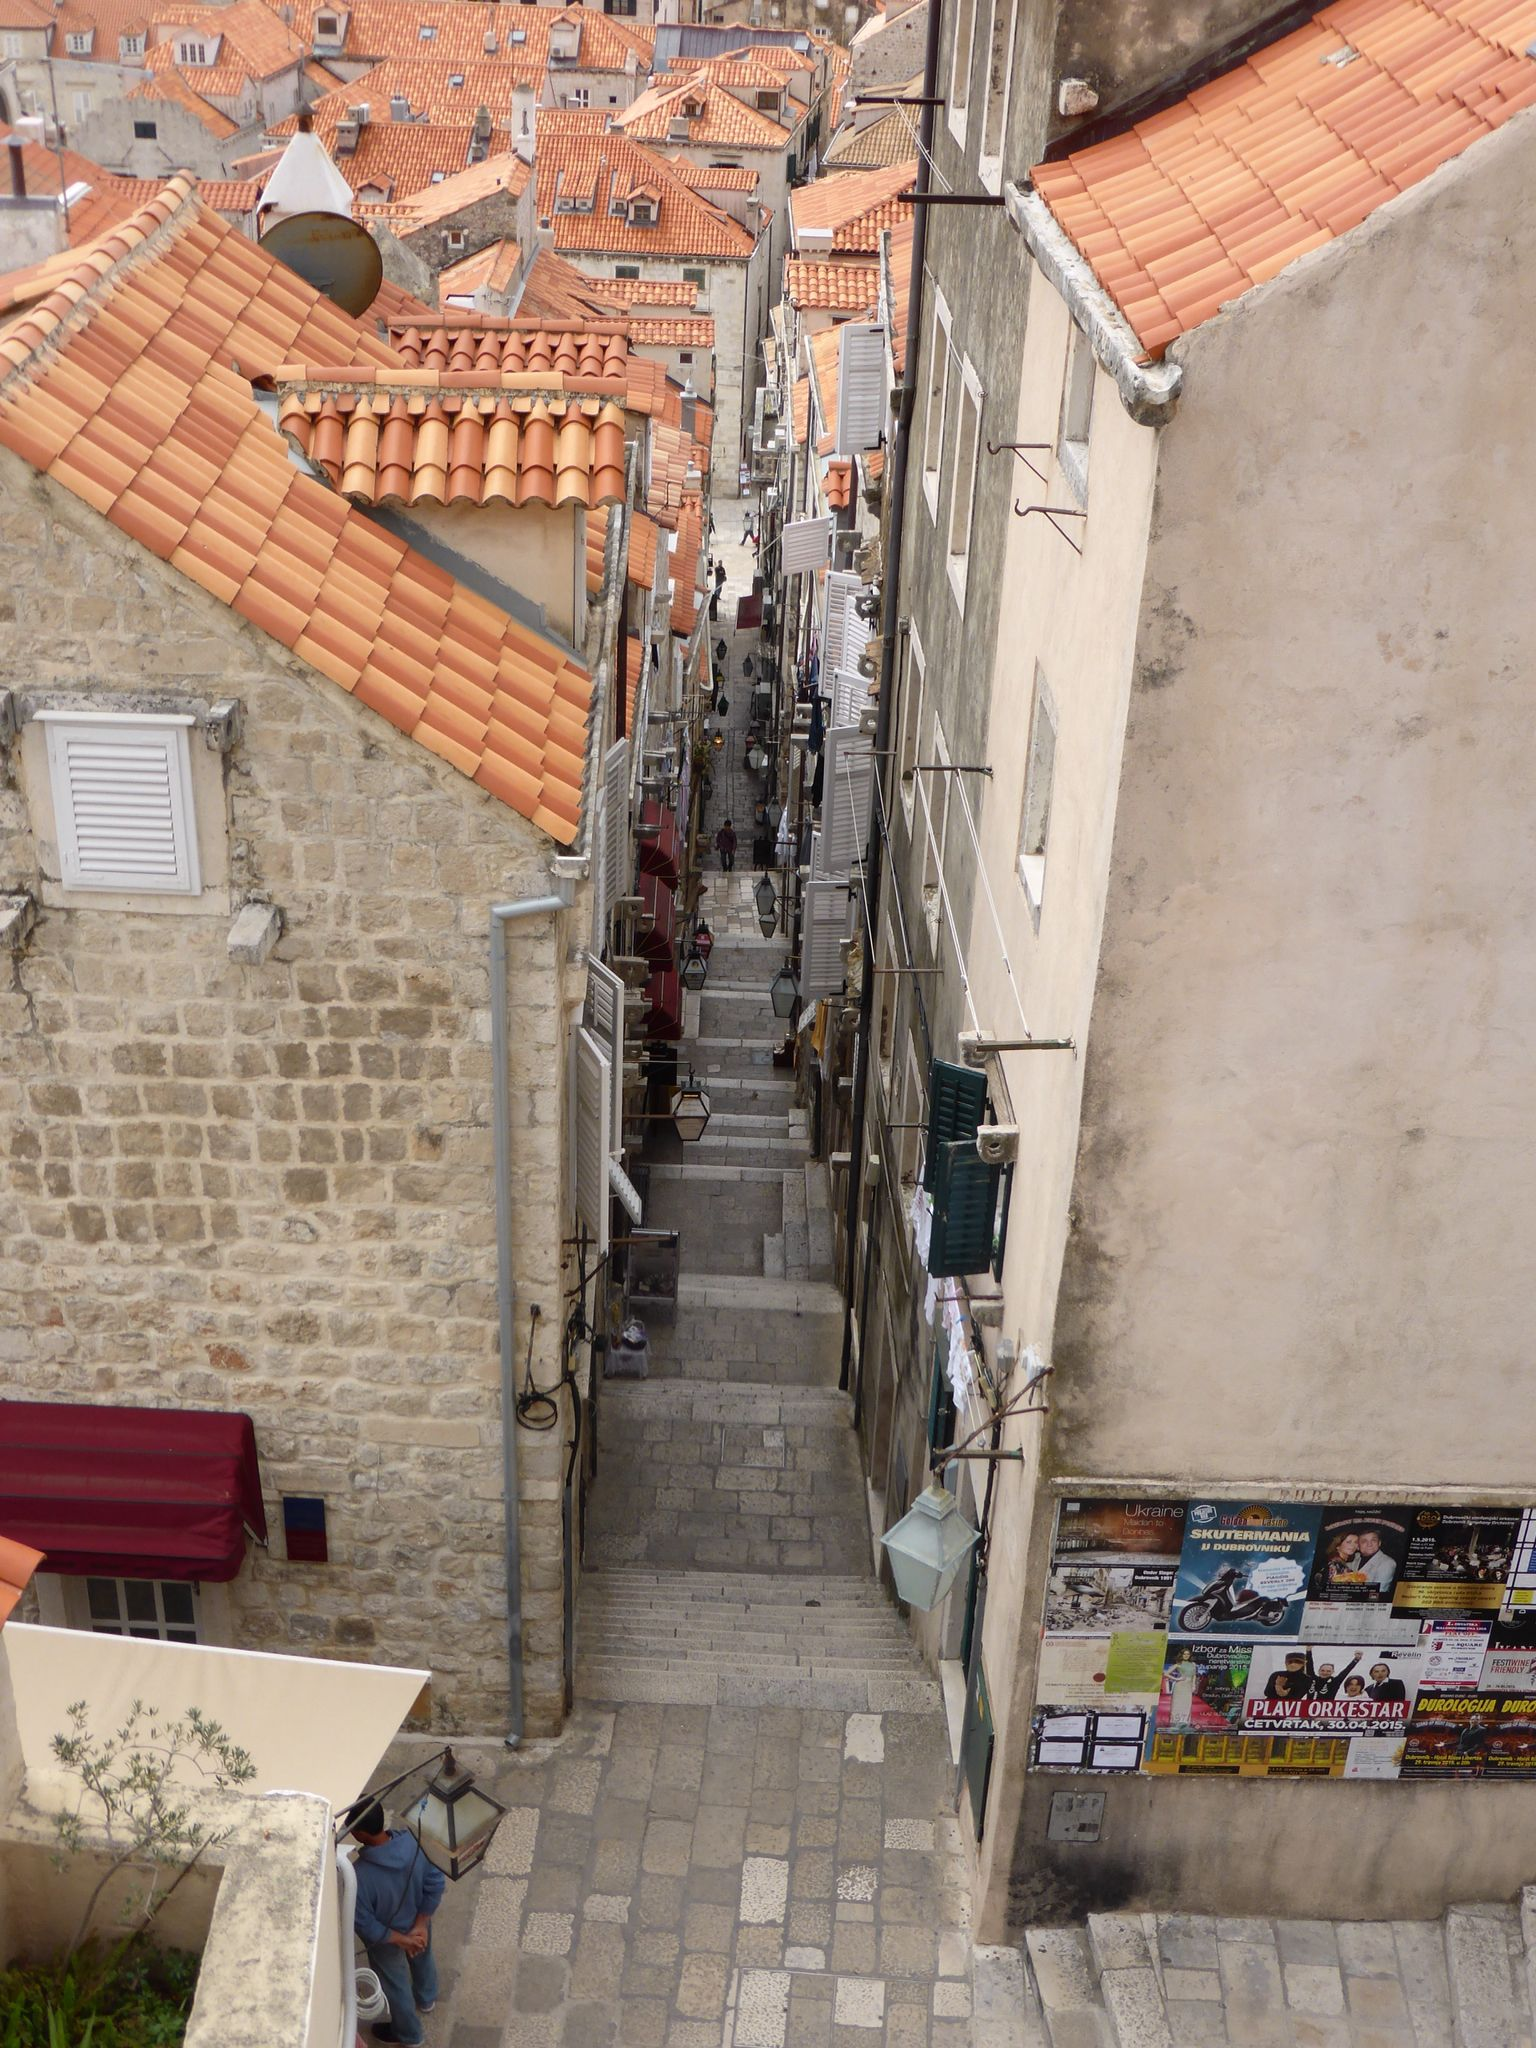 Lane way in Dubrovnik, Croatia